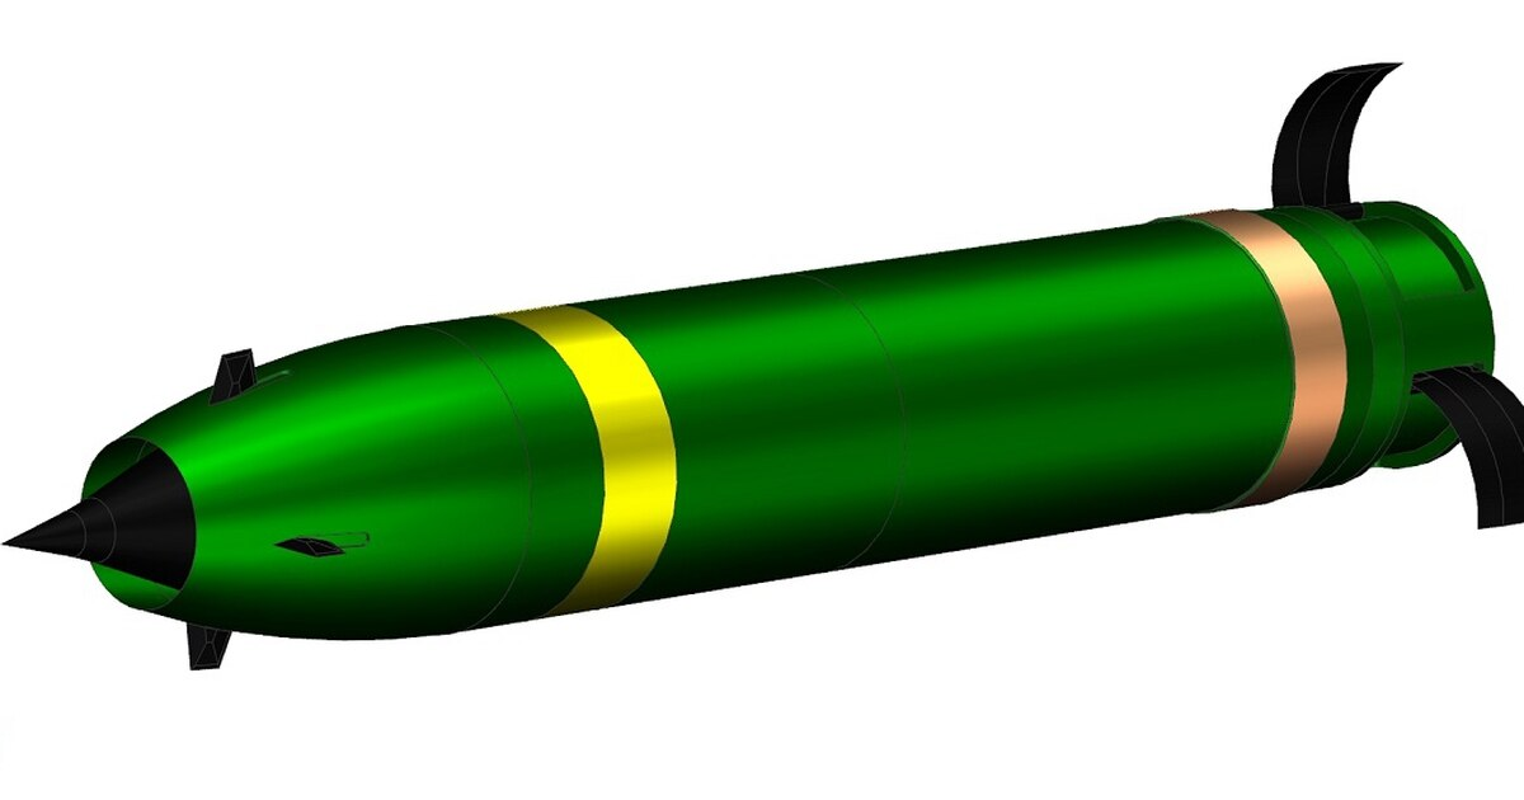 Dan tang tam XM1155 se giup phao 155mm cua My them phan dang so-Hinh-3